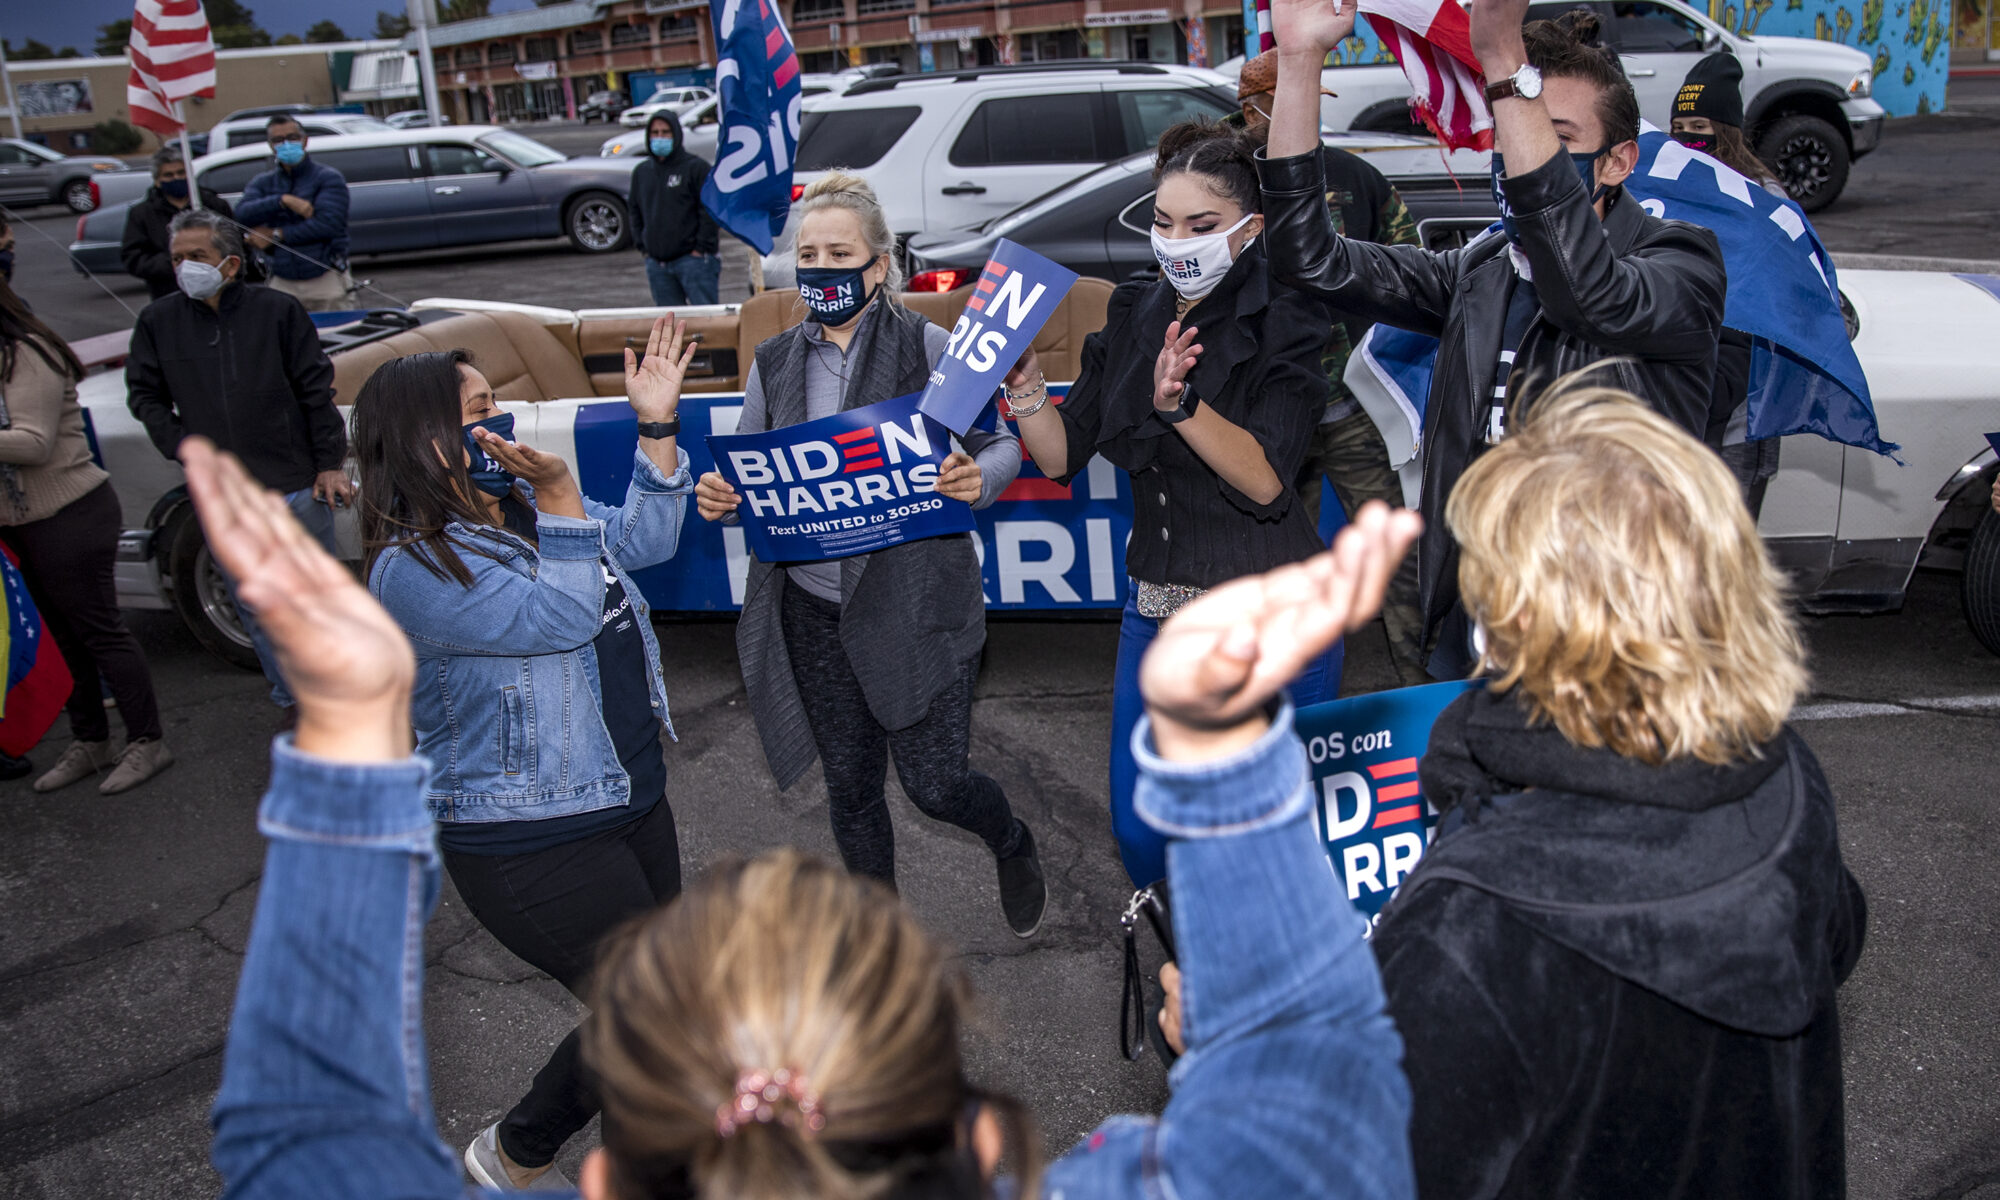 Un grupo celebra la victoria del Presidente electo Joe Biden en Las Vegas